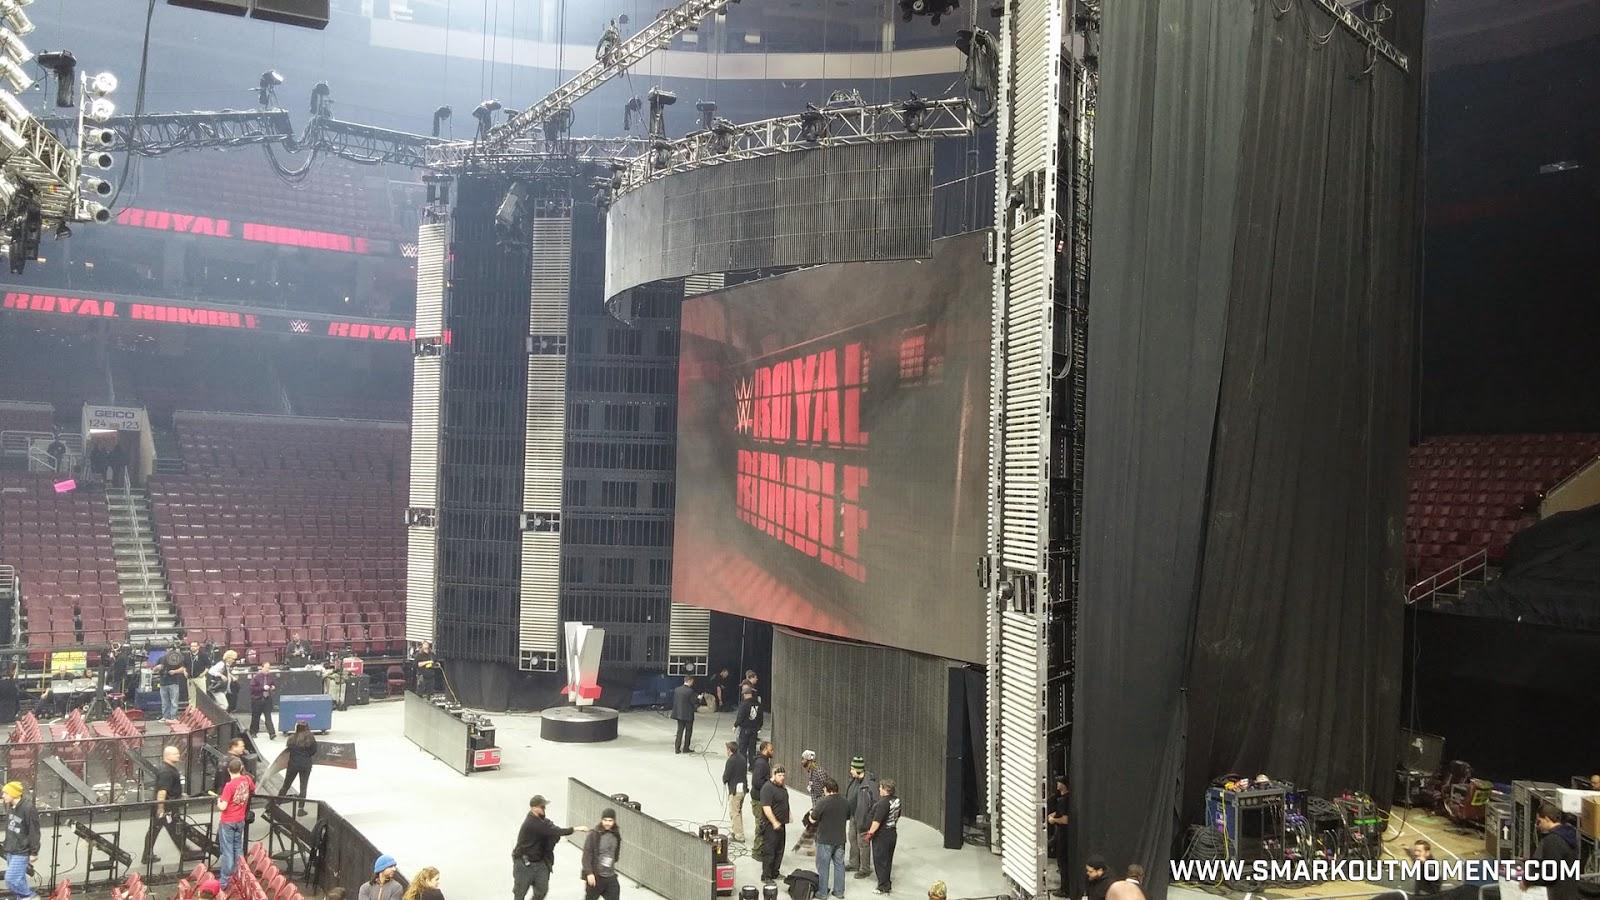 WWE Royal Rumble 2015 set view